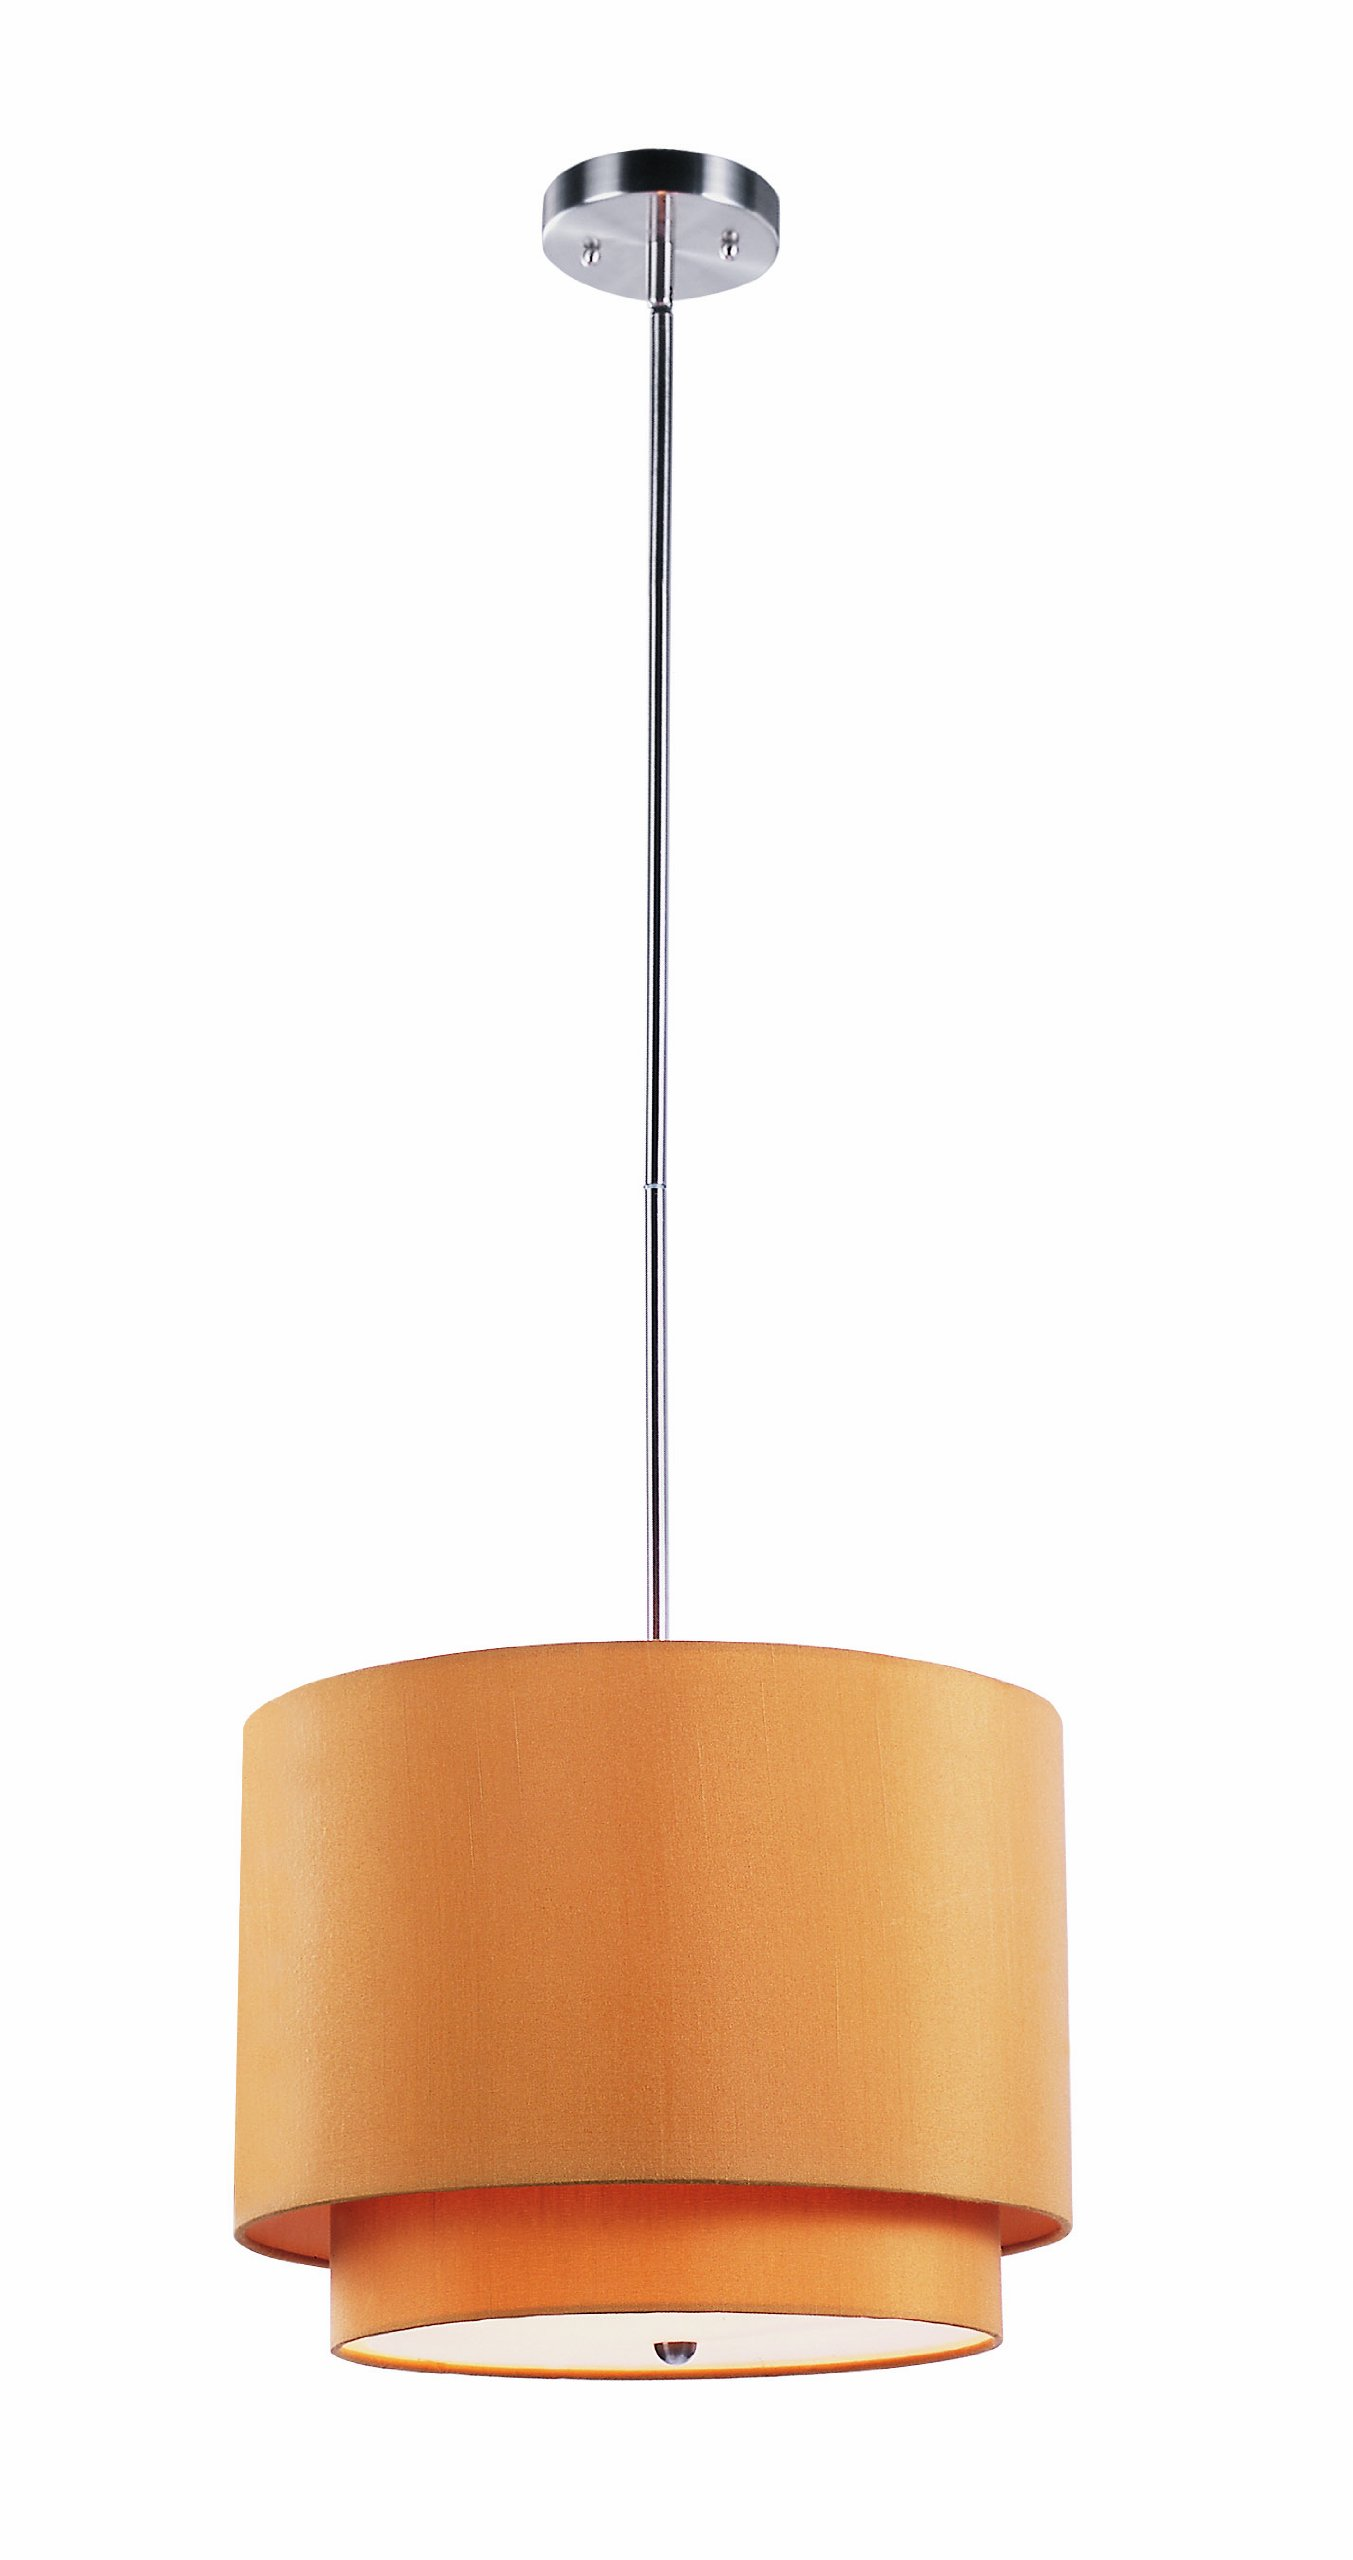 Trans Globe Lighting PND-801 MST Indoor Schiffer 15'' Pendant, Brushed Nickel